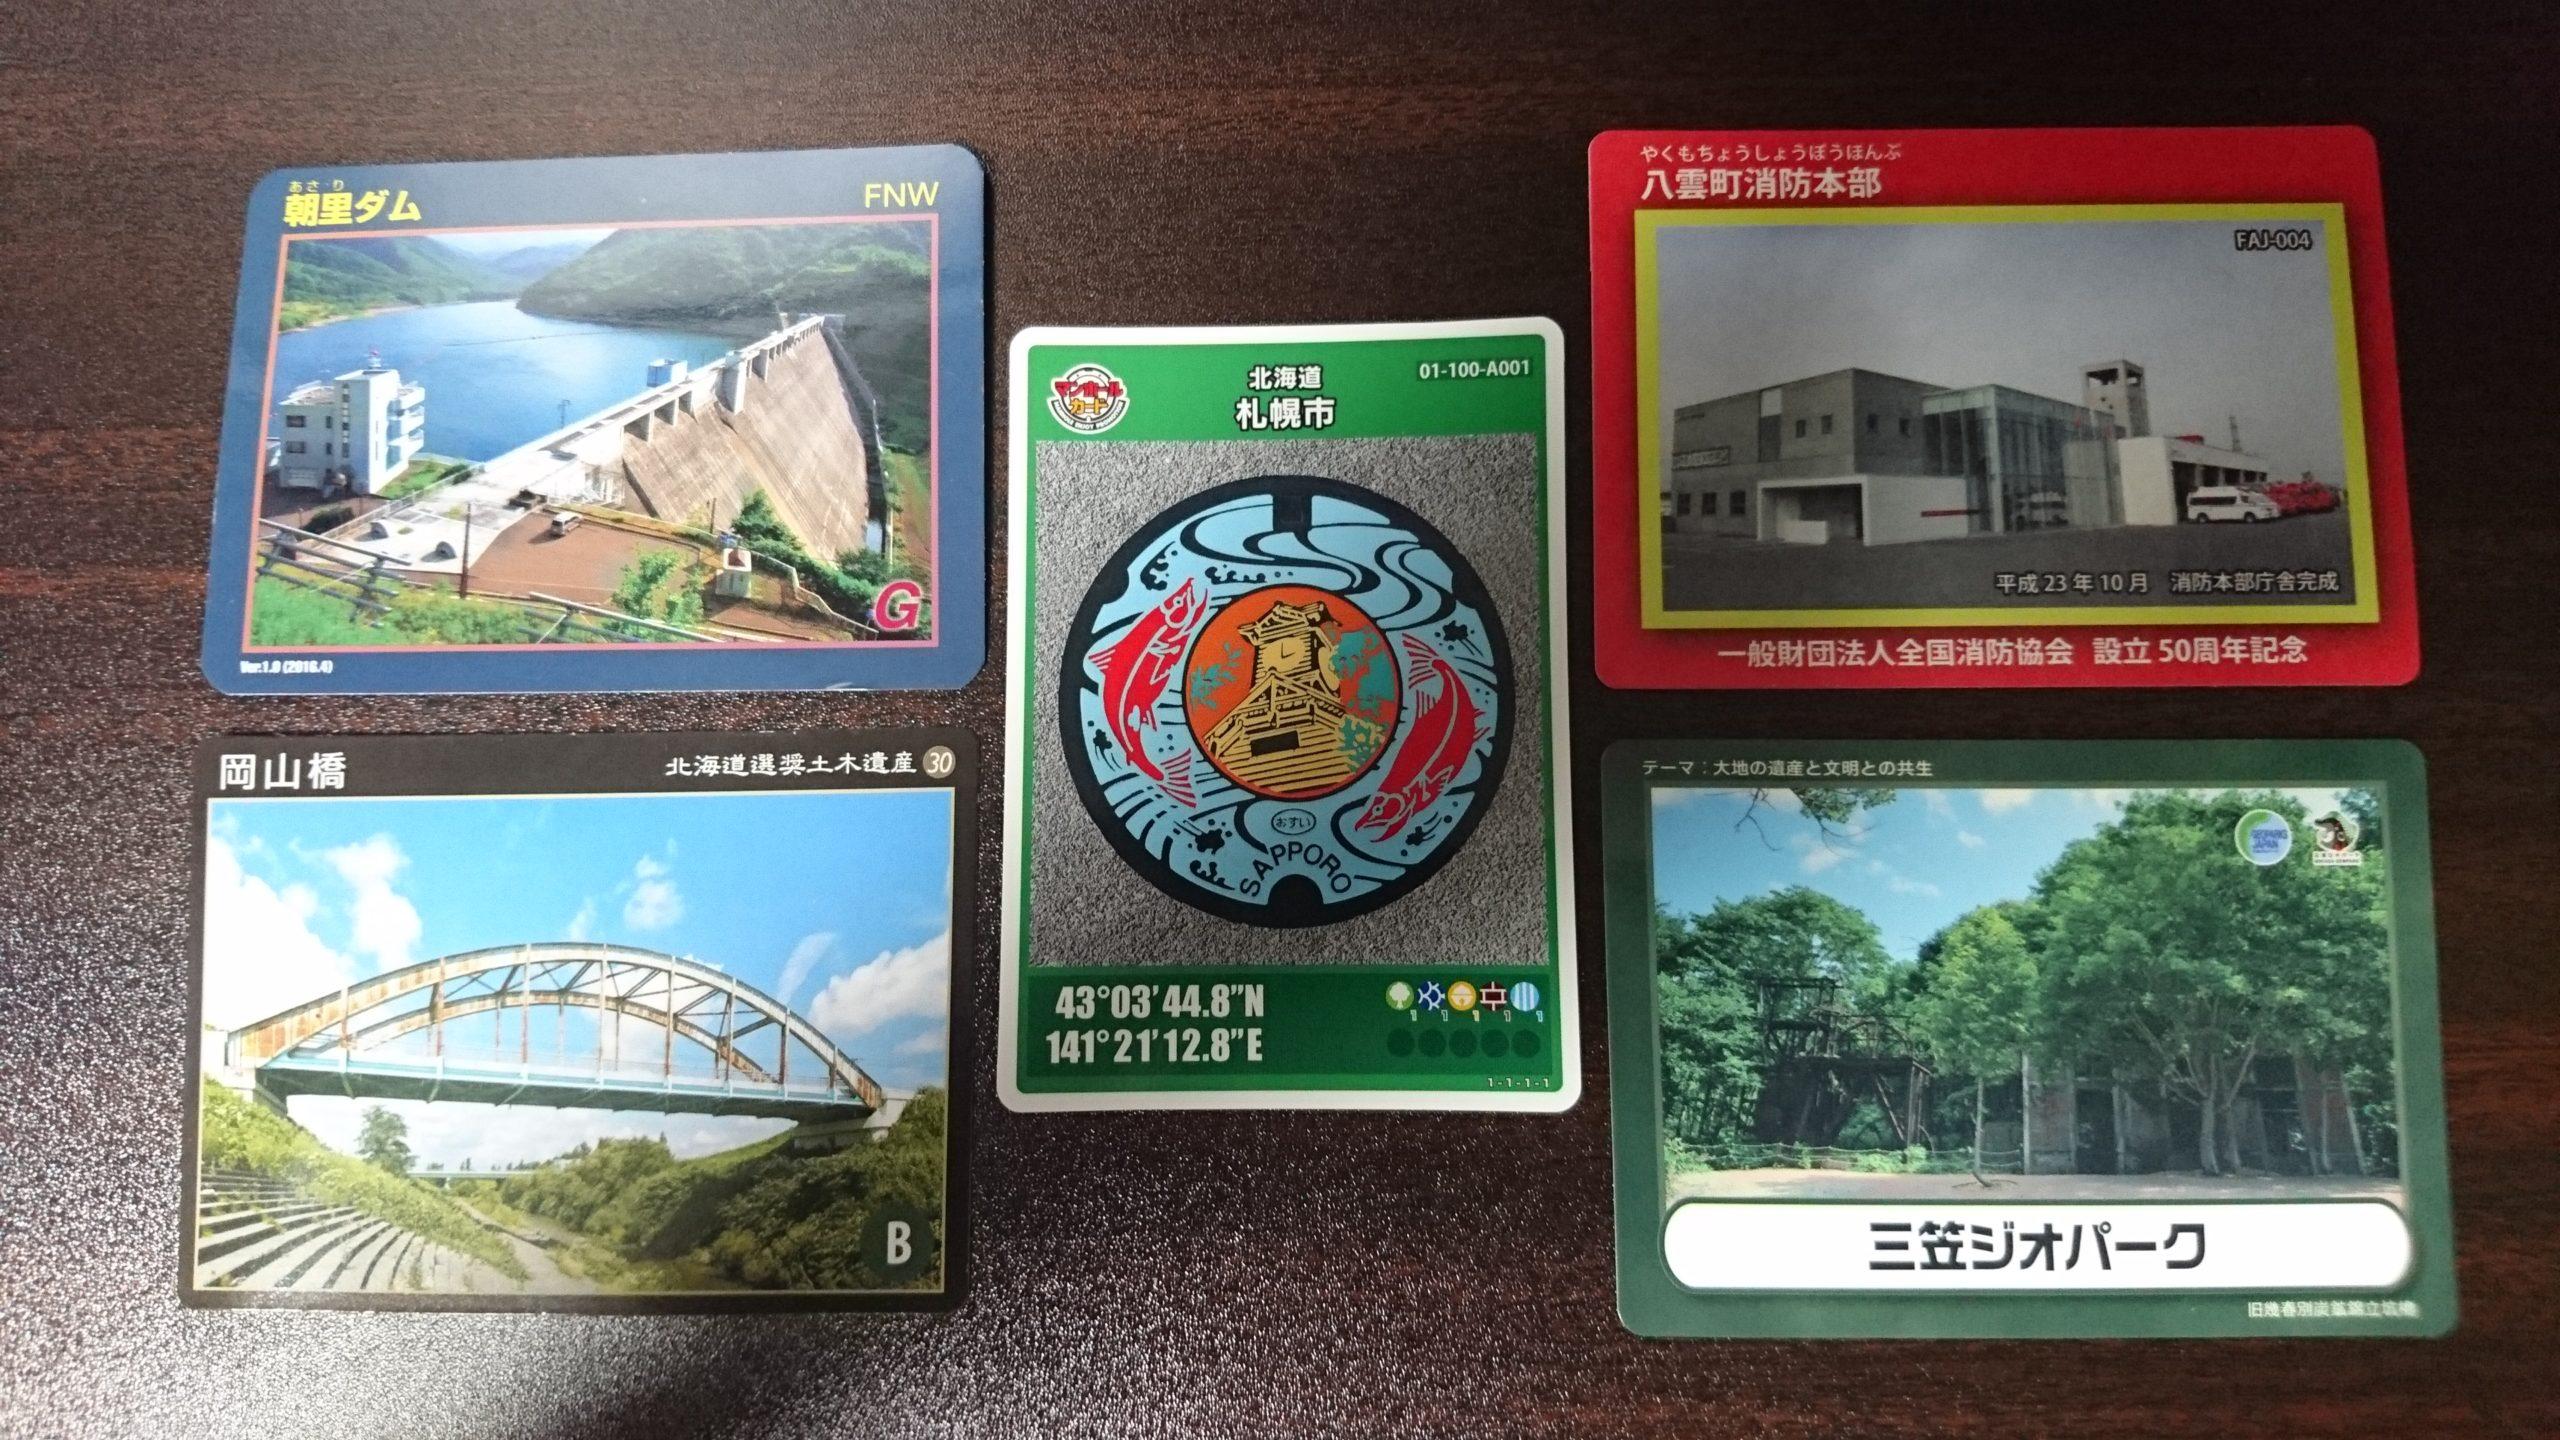 北海道内の公共配布カード一覧